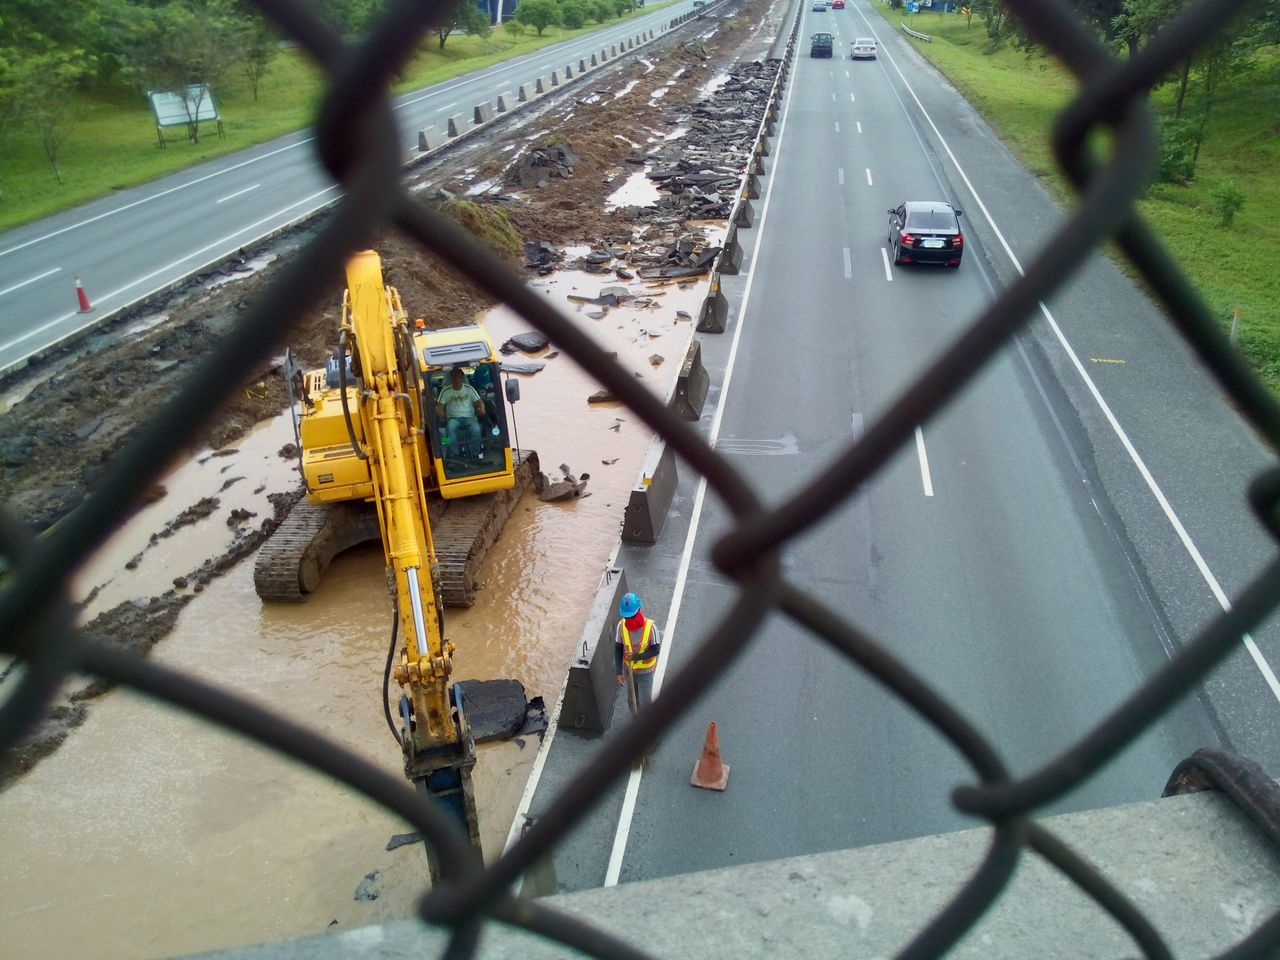 North Luzon Expressway Nlex Widening Superhighway Road Widening Philippine Road Philippine Change Change Is Coming Duterte2016 Duterte Administration